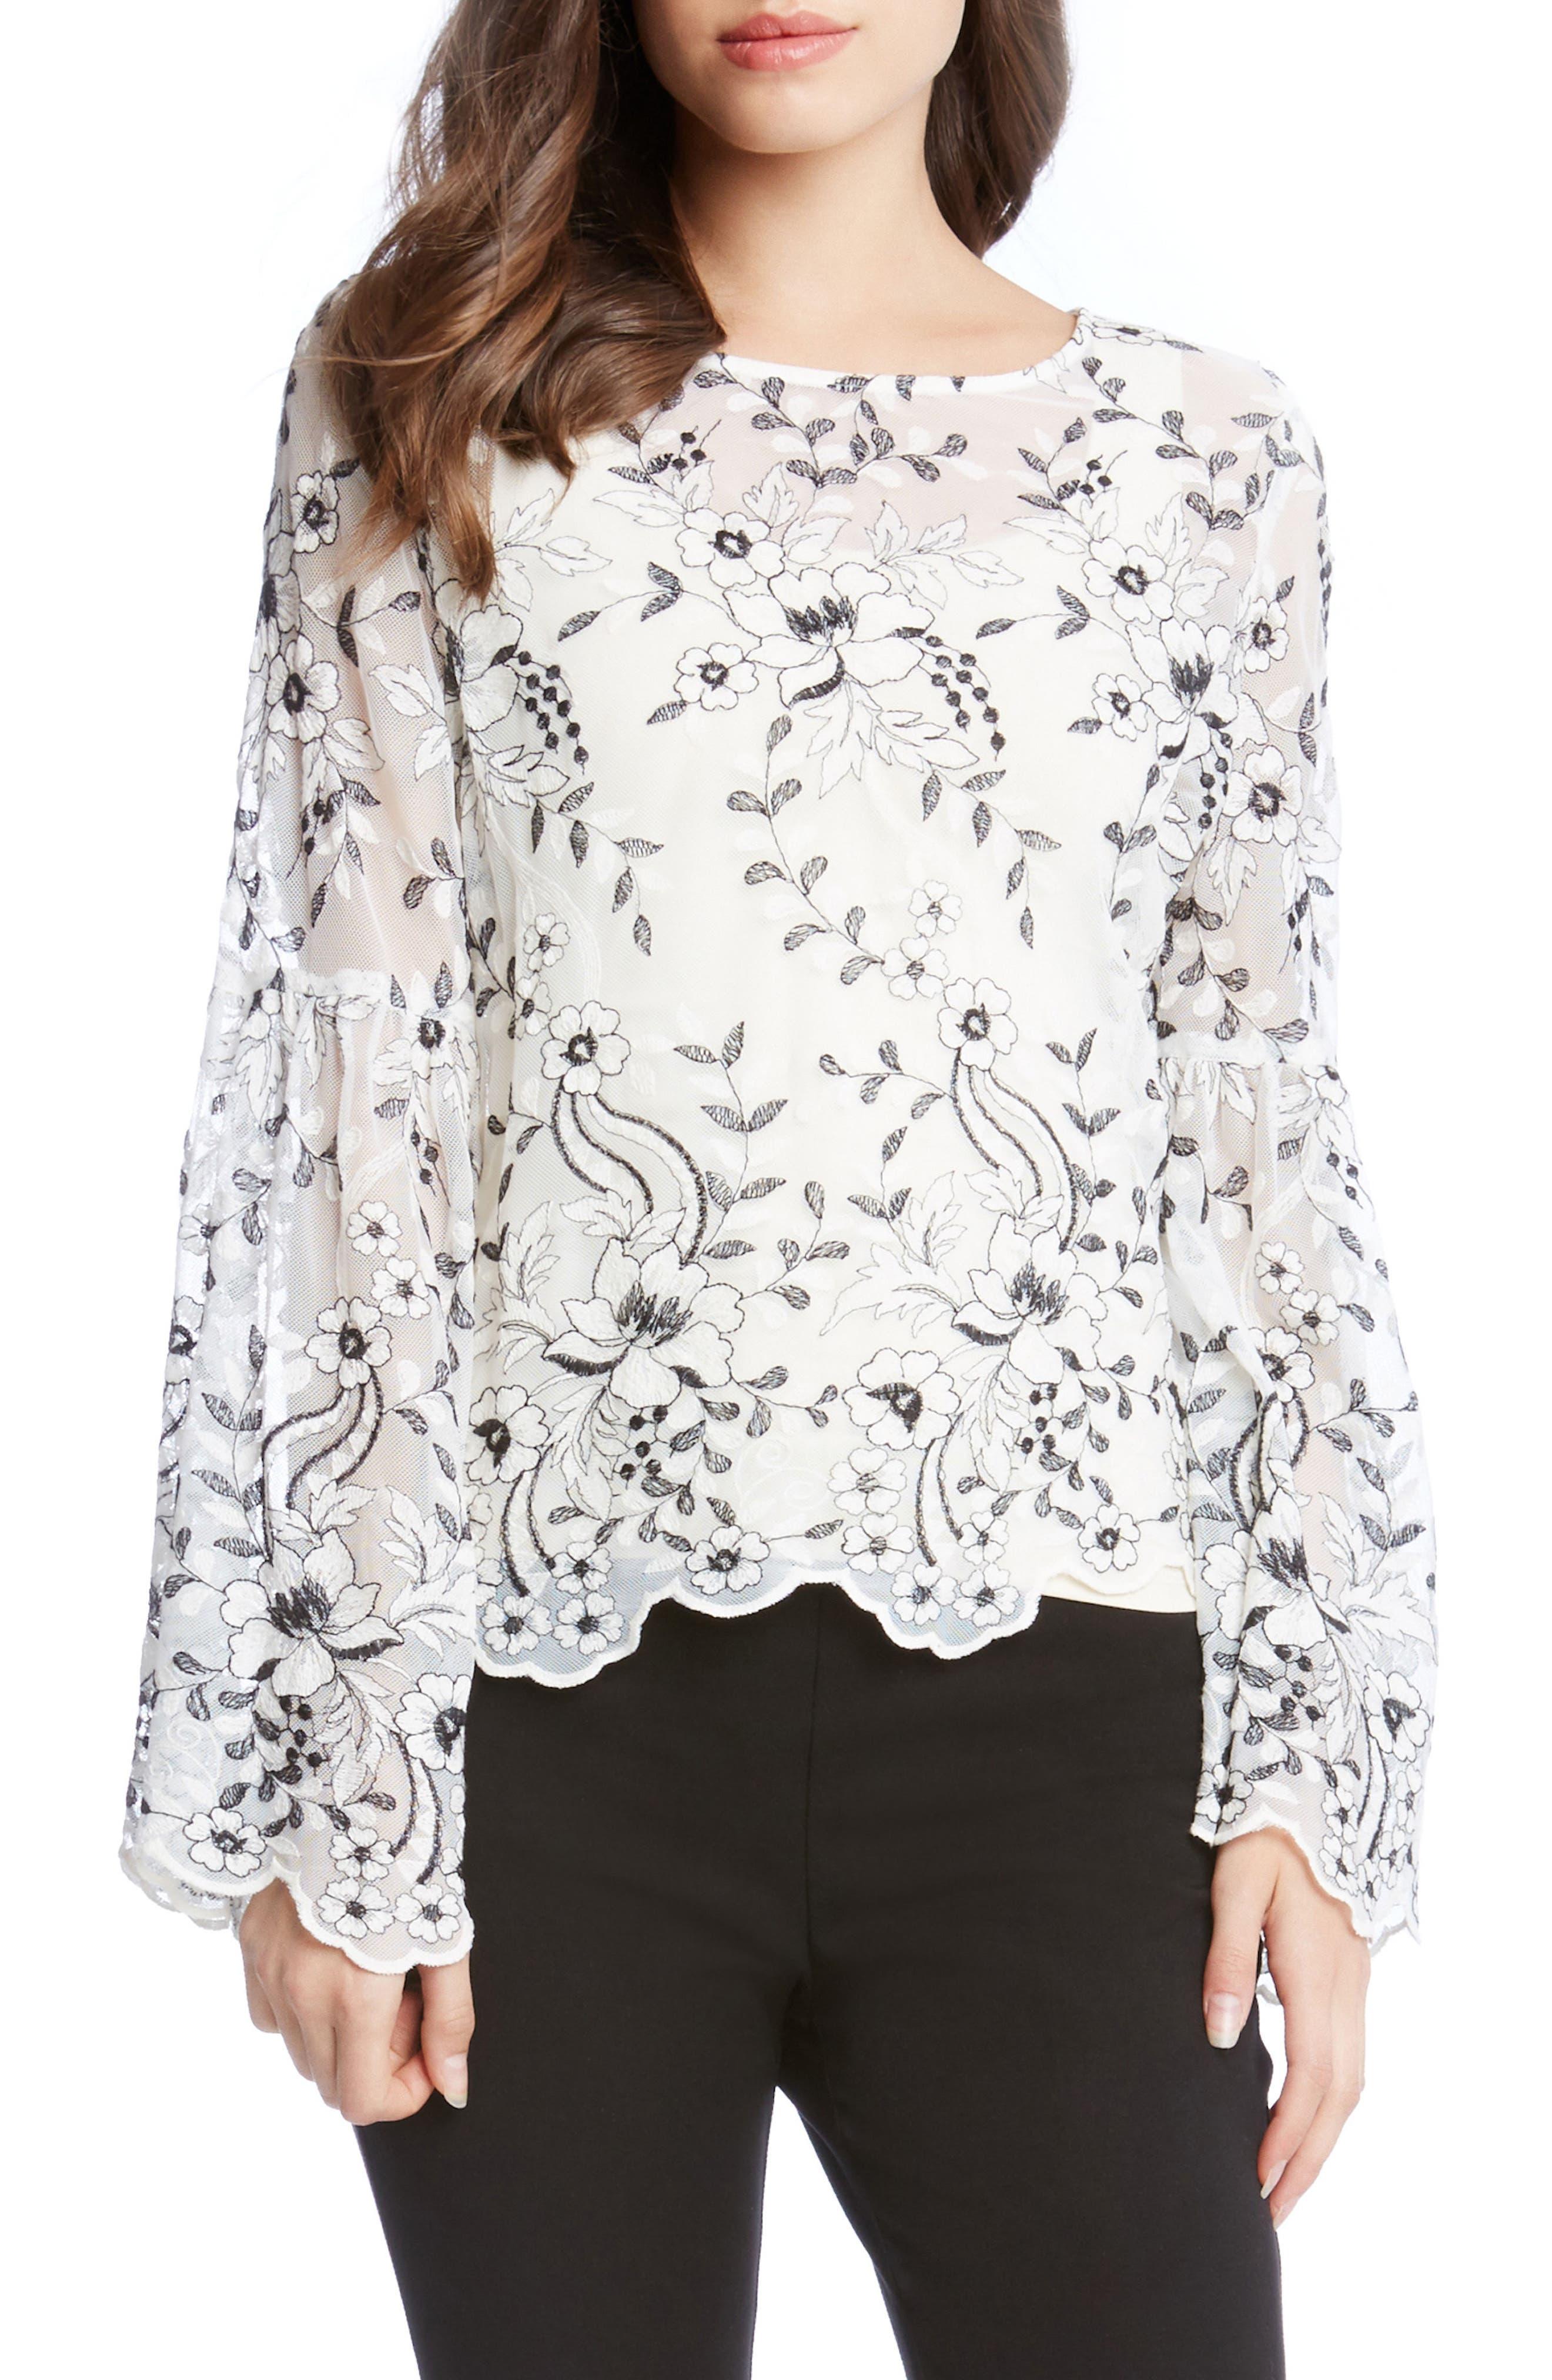 Alternate Image 1 Selected - Karen Kane Embroidered Bell Sleeve Blouse